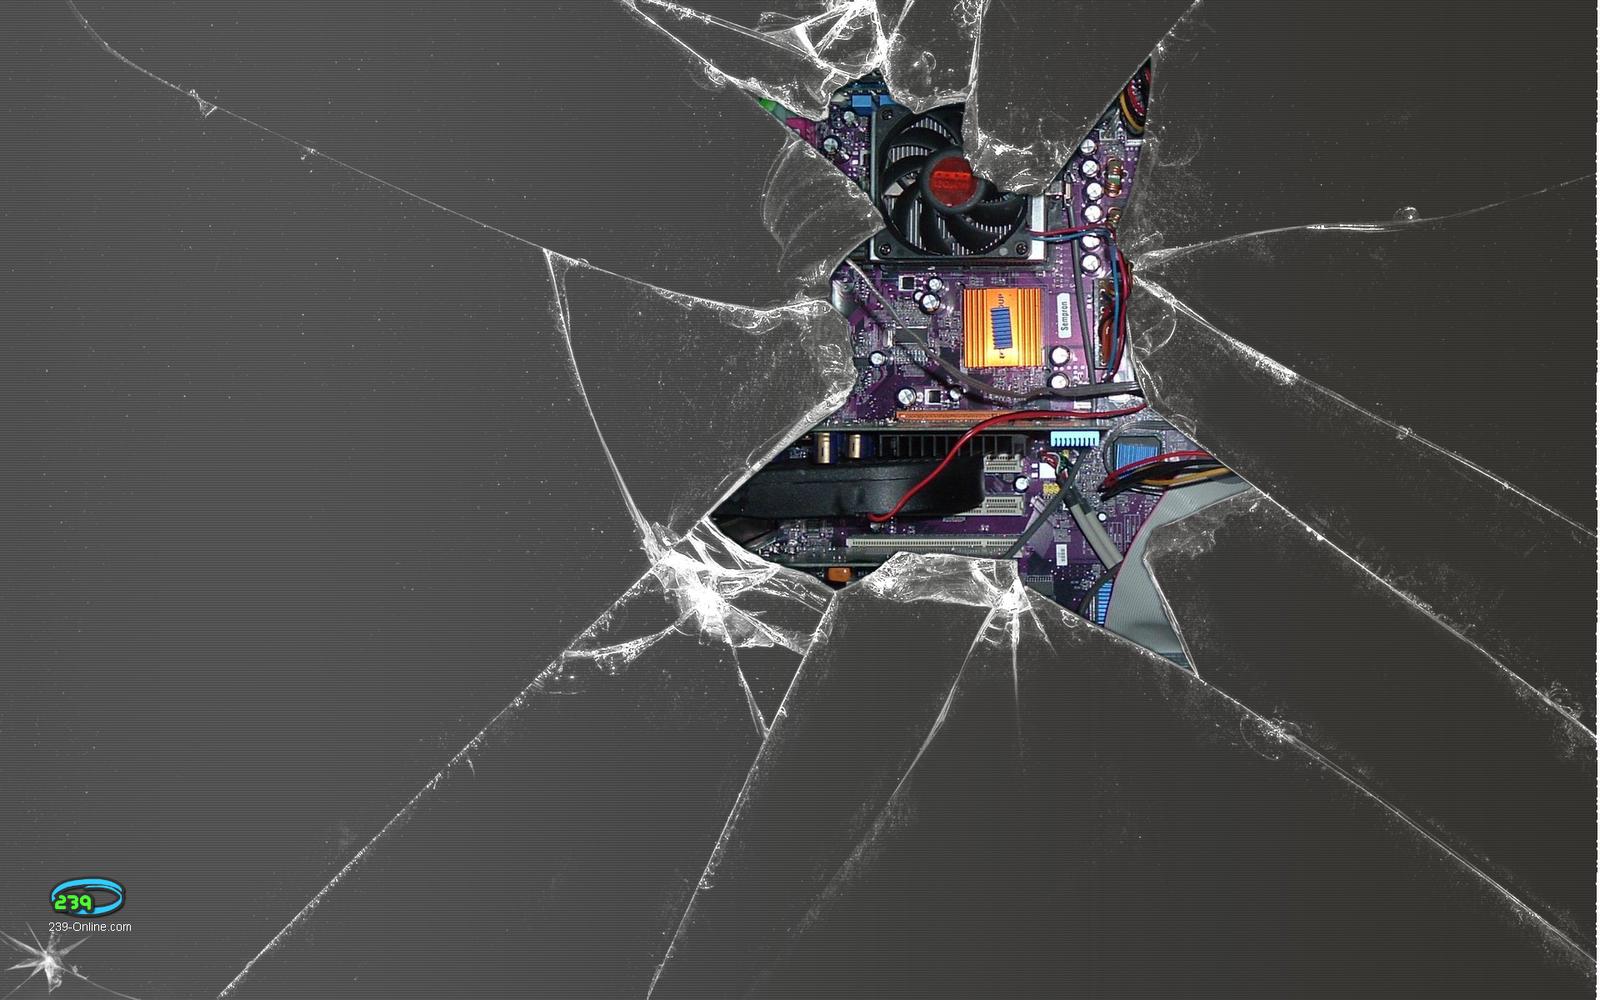 Mashababko Space Vortex Wallpaper: HD 3 Screen Wallpaper